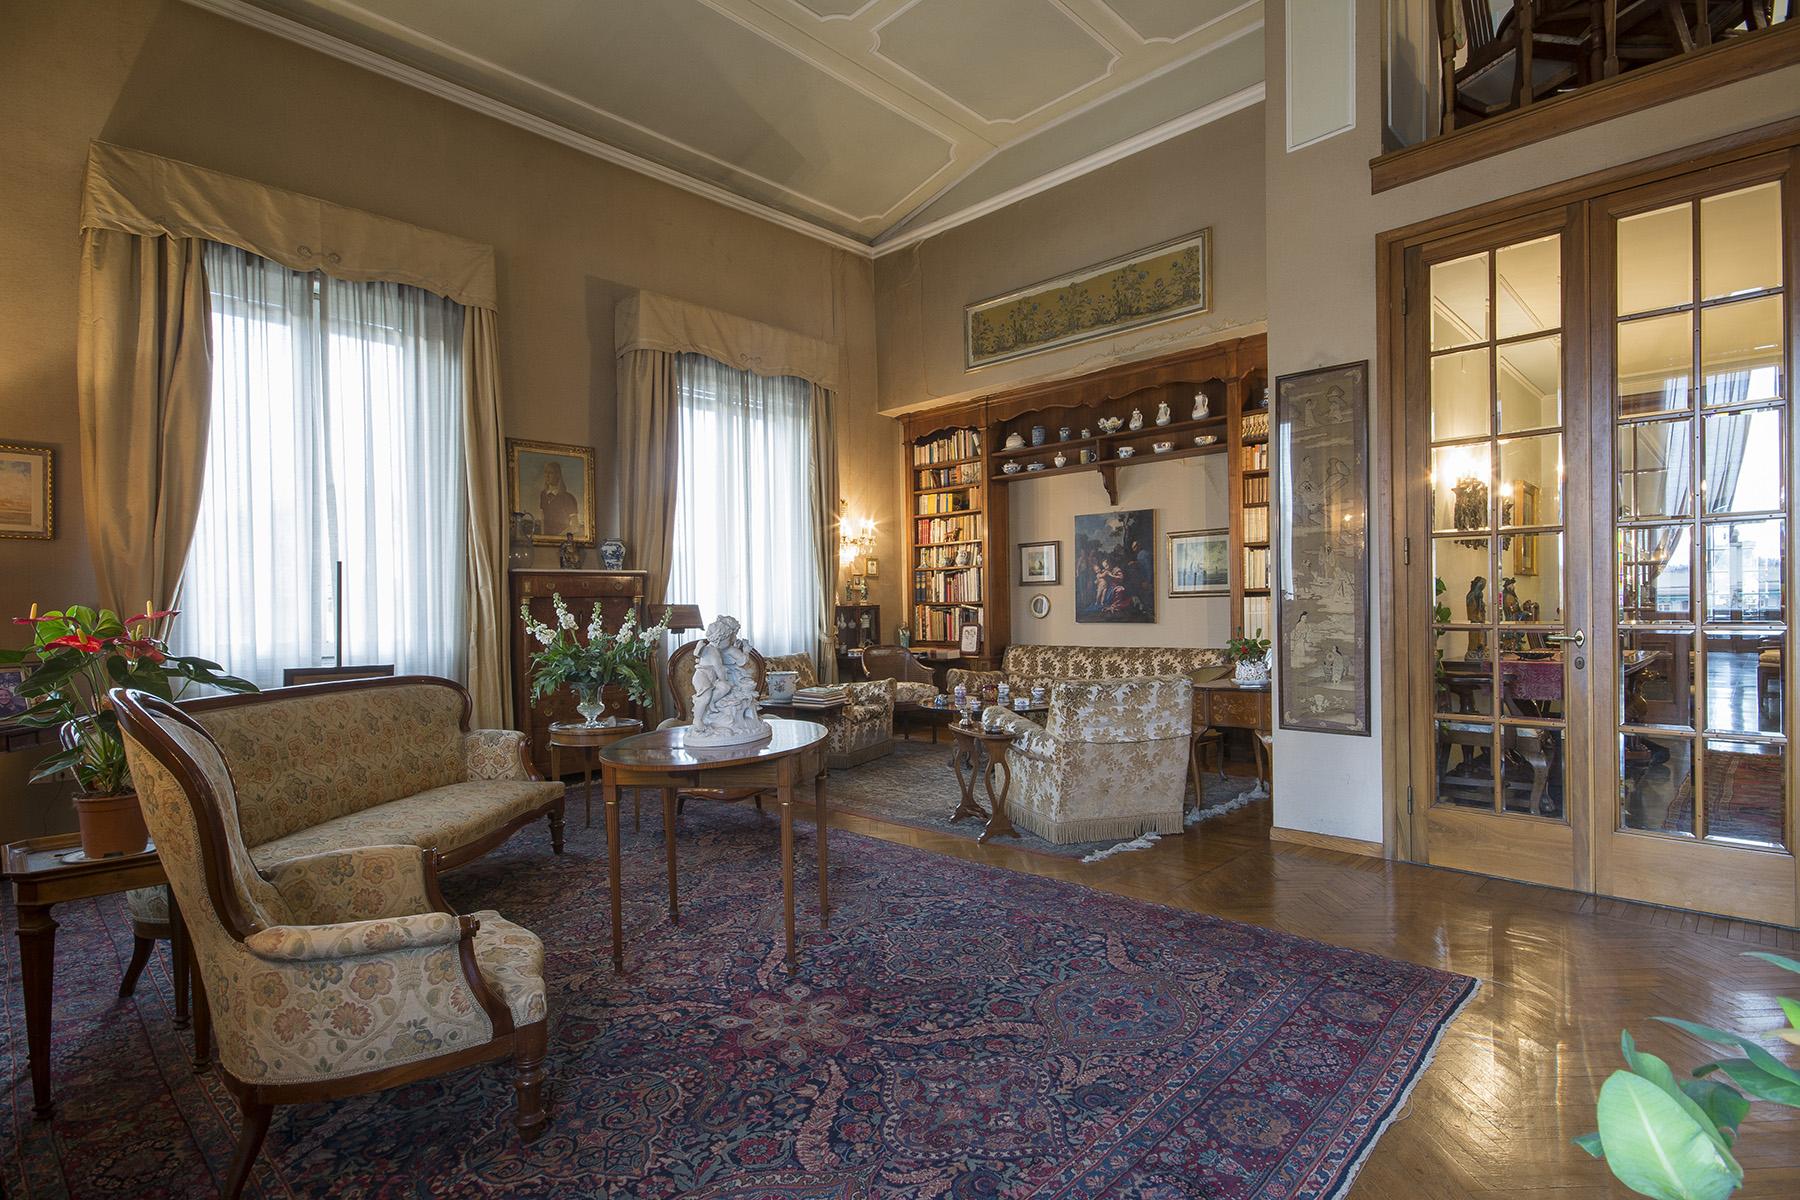 Attico in Vendita a Firenze: 5 locali, 400 mq - Foto 3